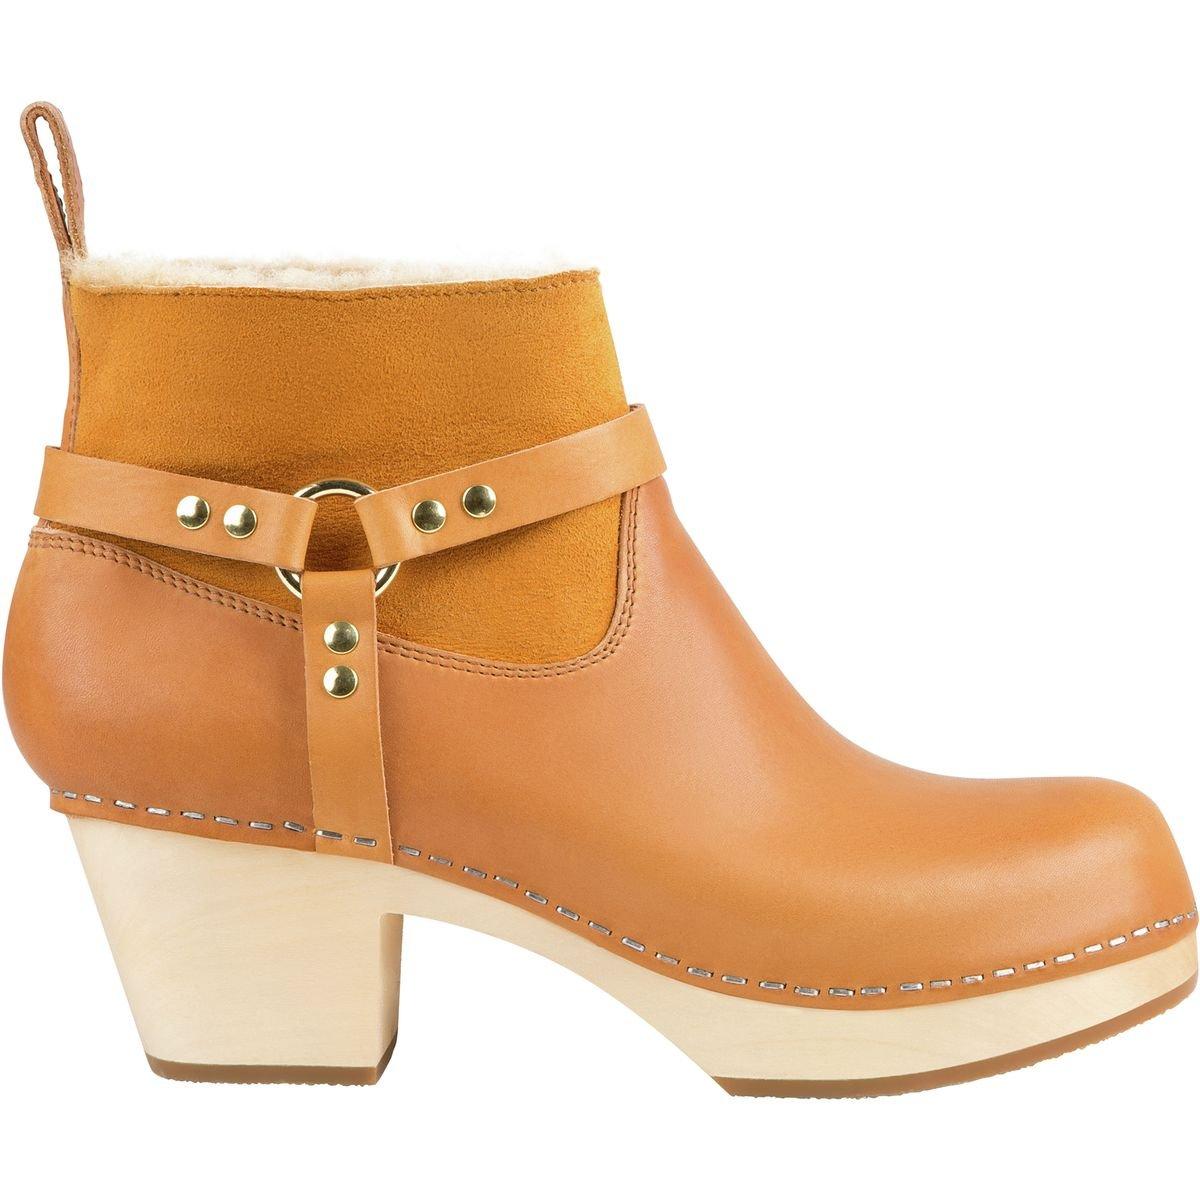 swedish hasbeens Women's Rivet Ankle Boot B06VVYD6DL 39 Regular EU (9 US)|Nature